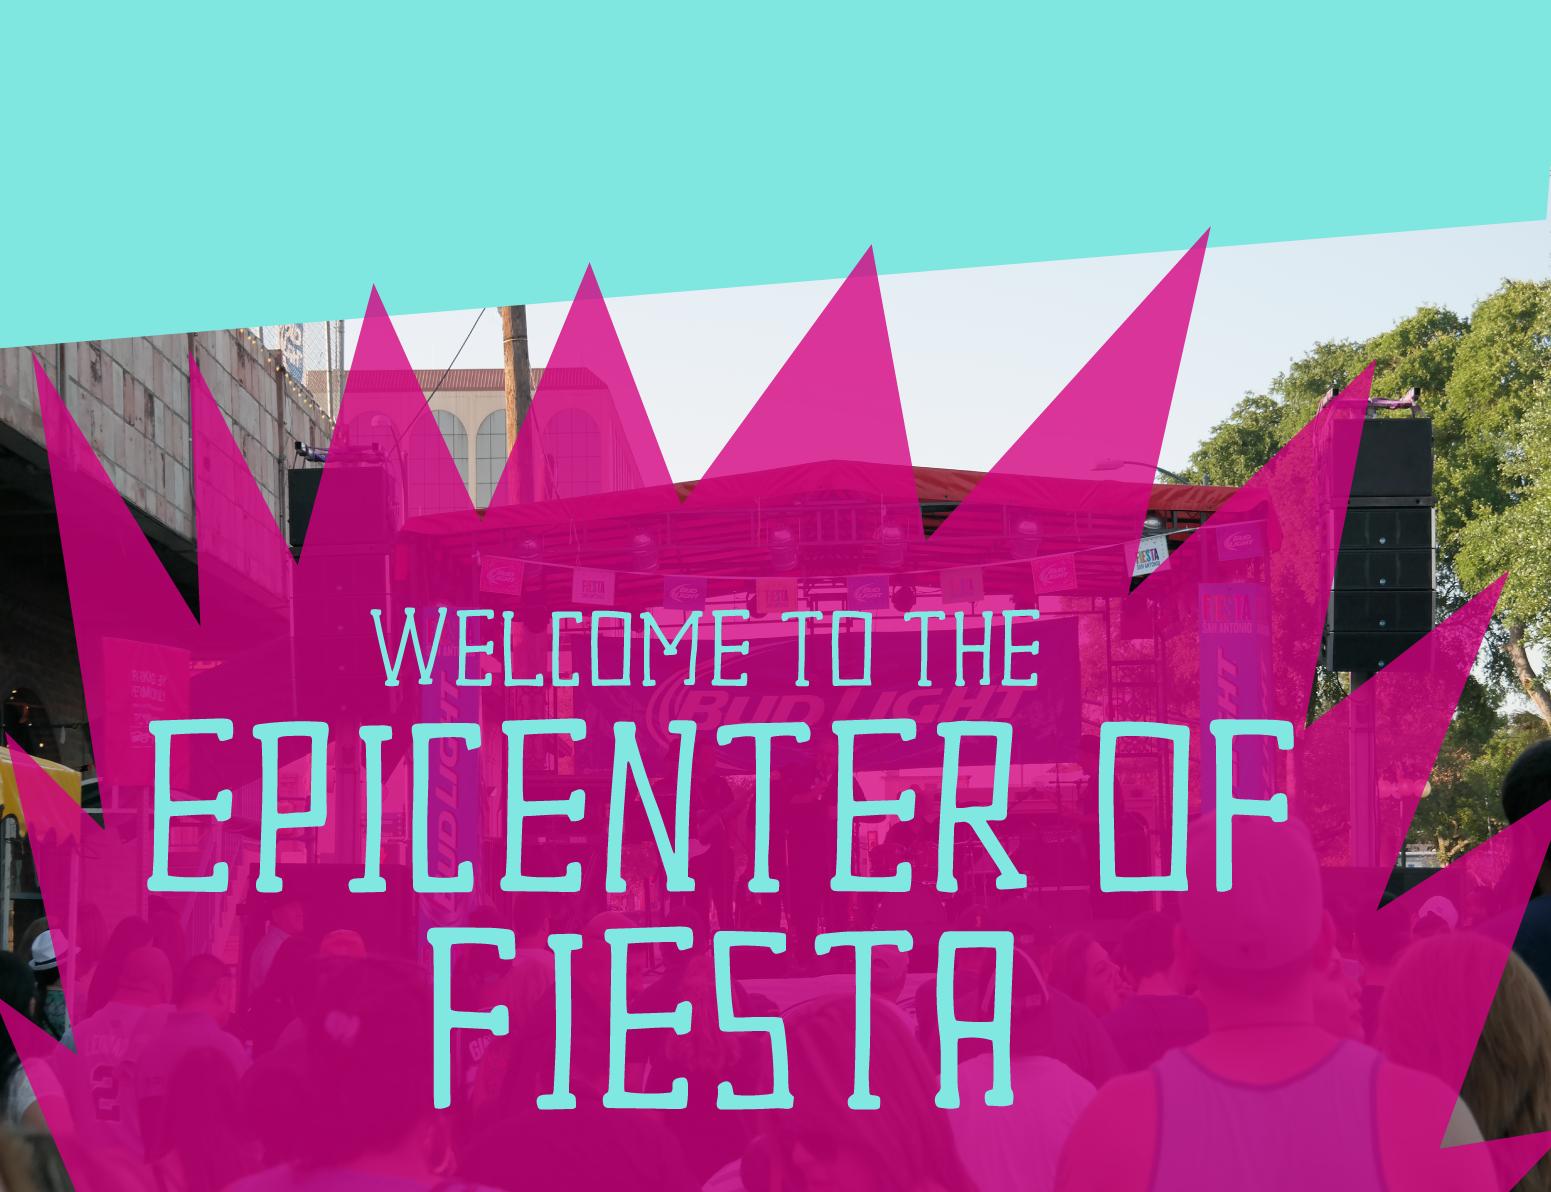 epicenter_fiesta3.png